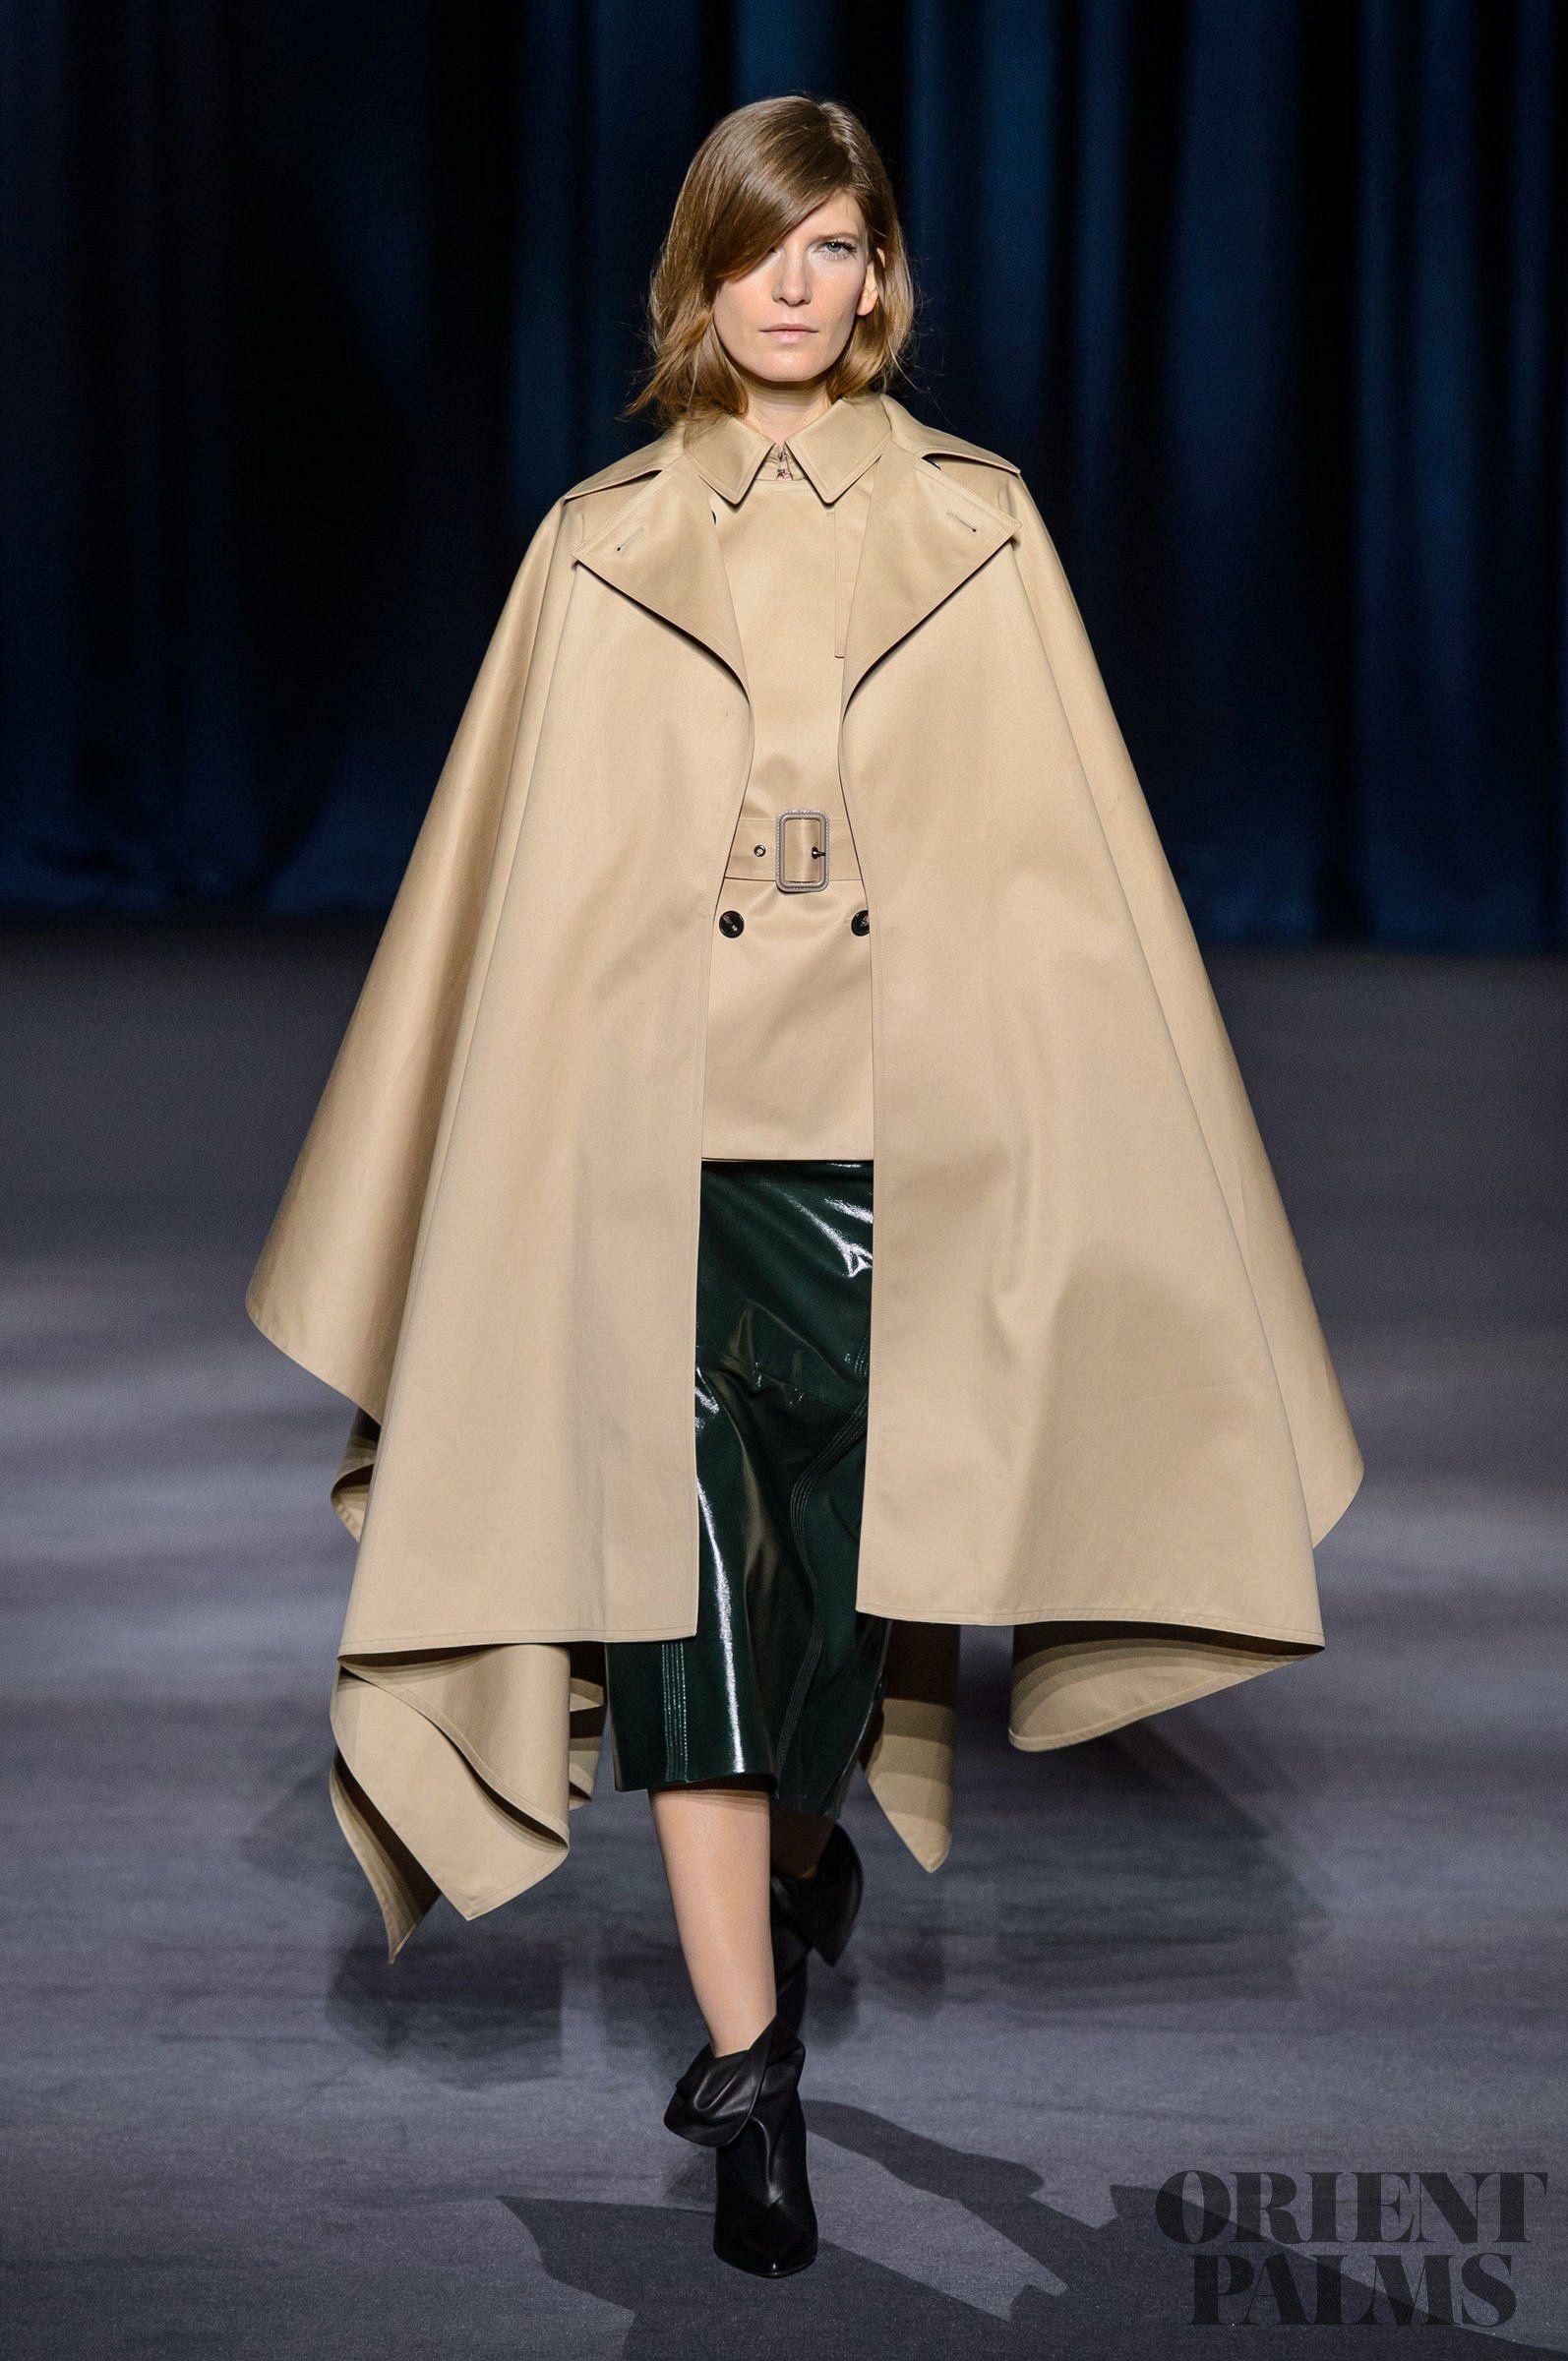 2019 Winter Trend: 15 Midi Sweater Dresses photo